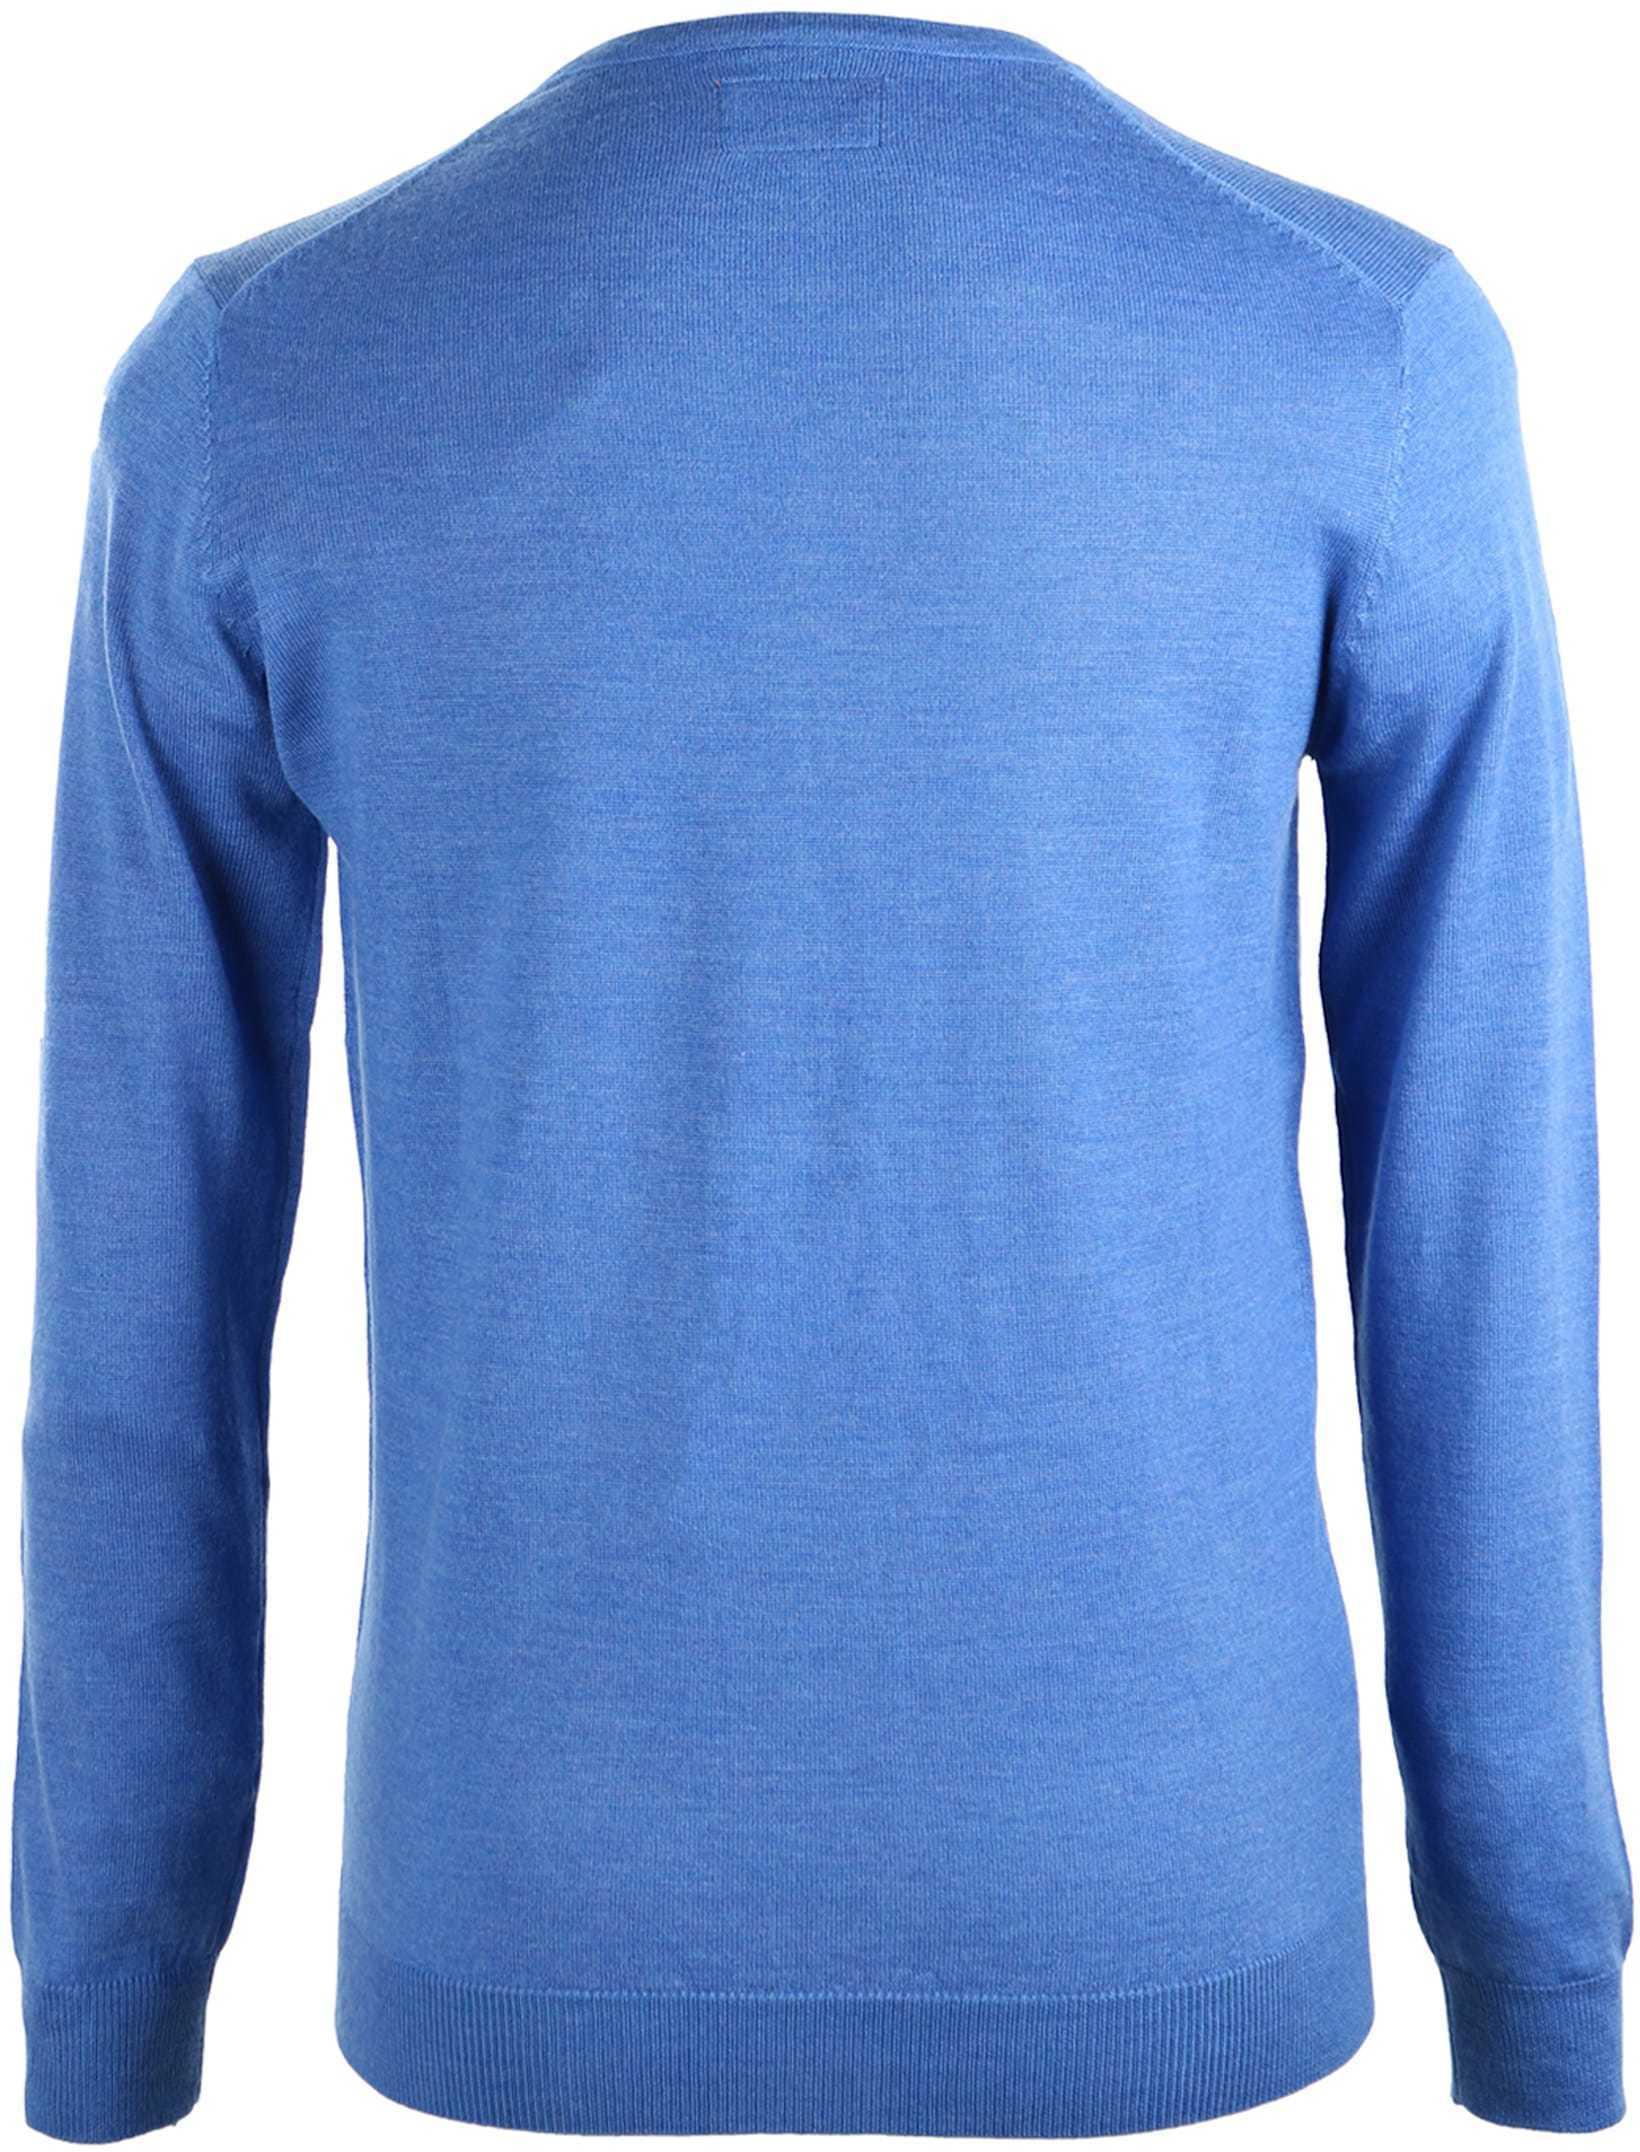 Suitable Pullover Merino Wol Blauw foto 1